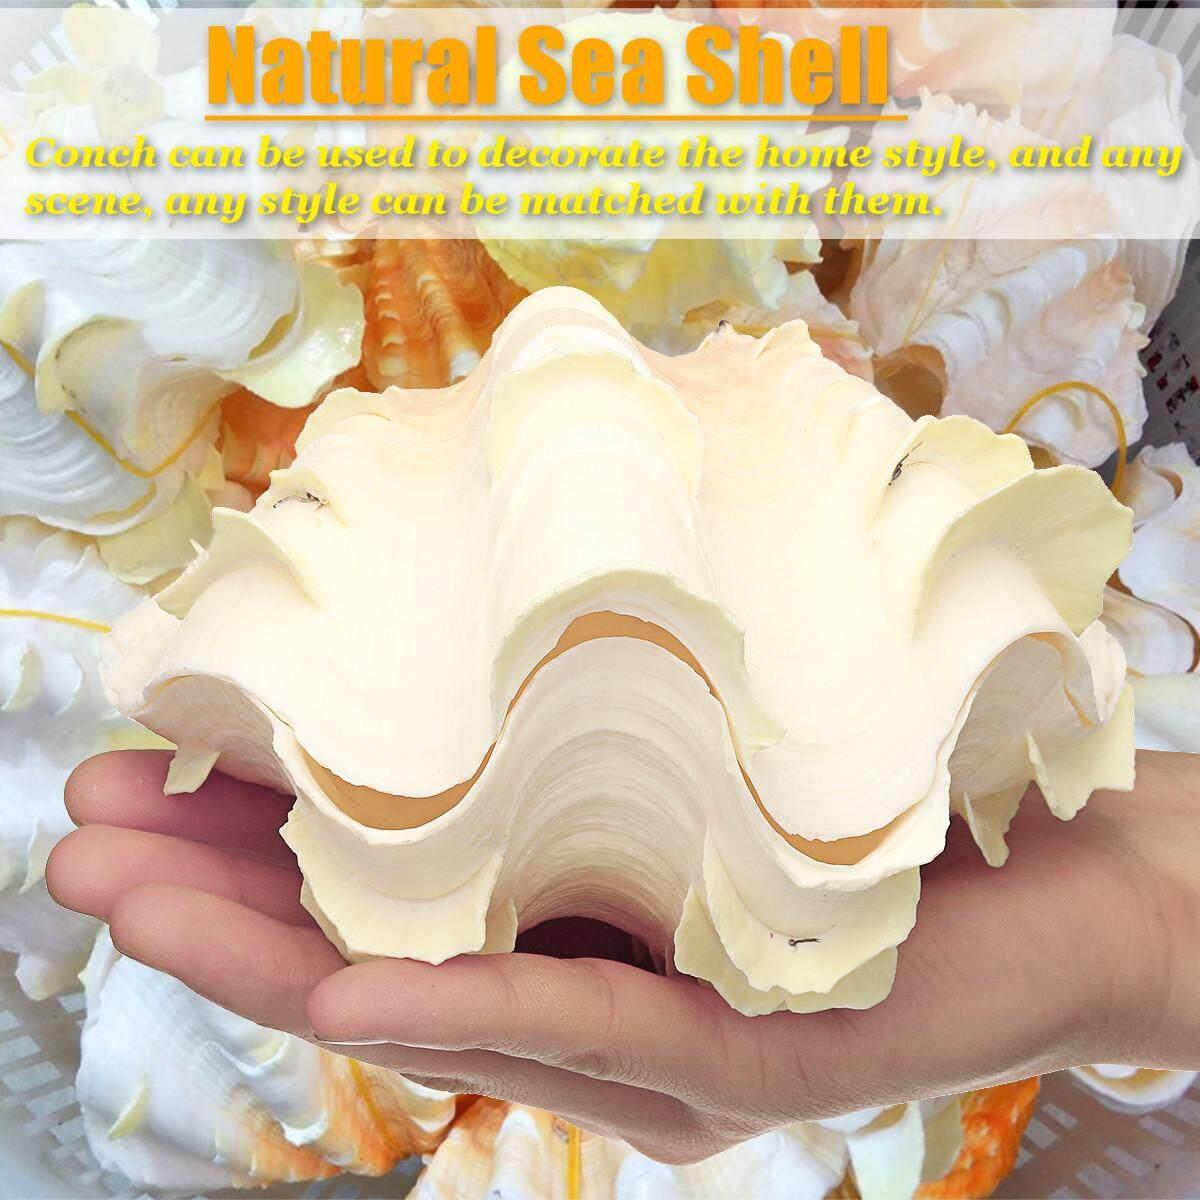 16-18cm Natural Sea Shell Conch Collectible Home Furnishing Marine Sea Decor